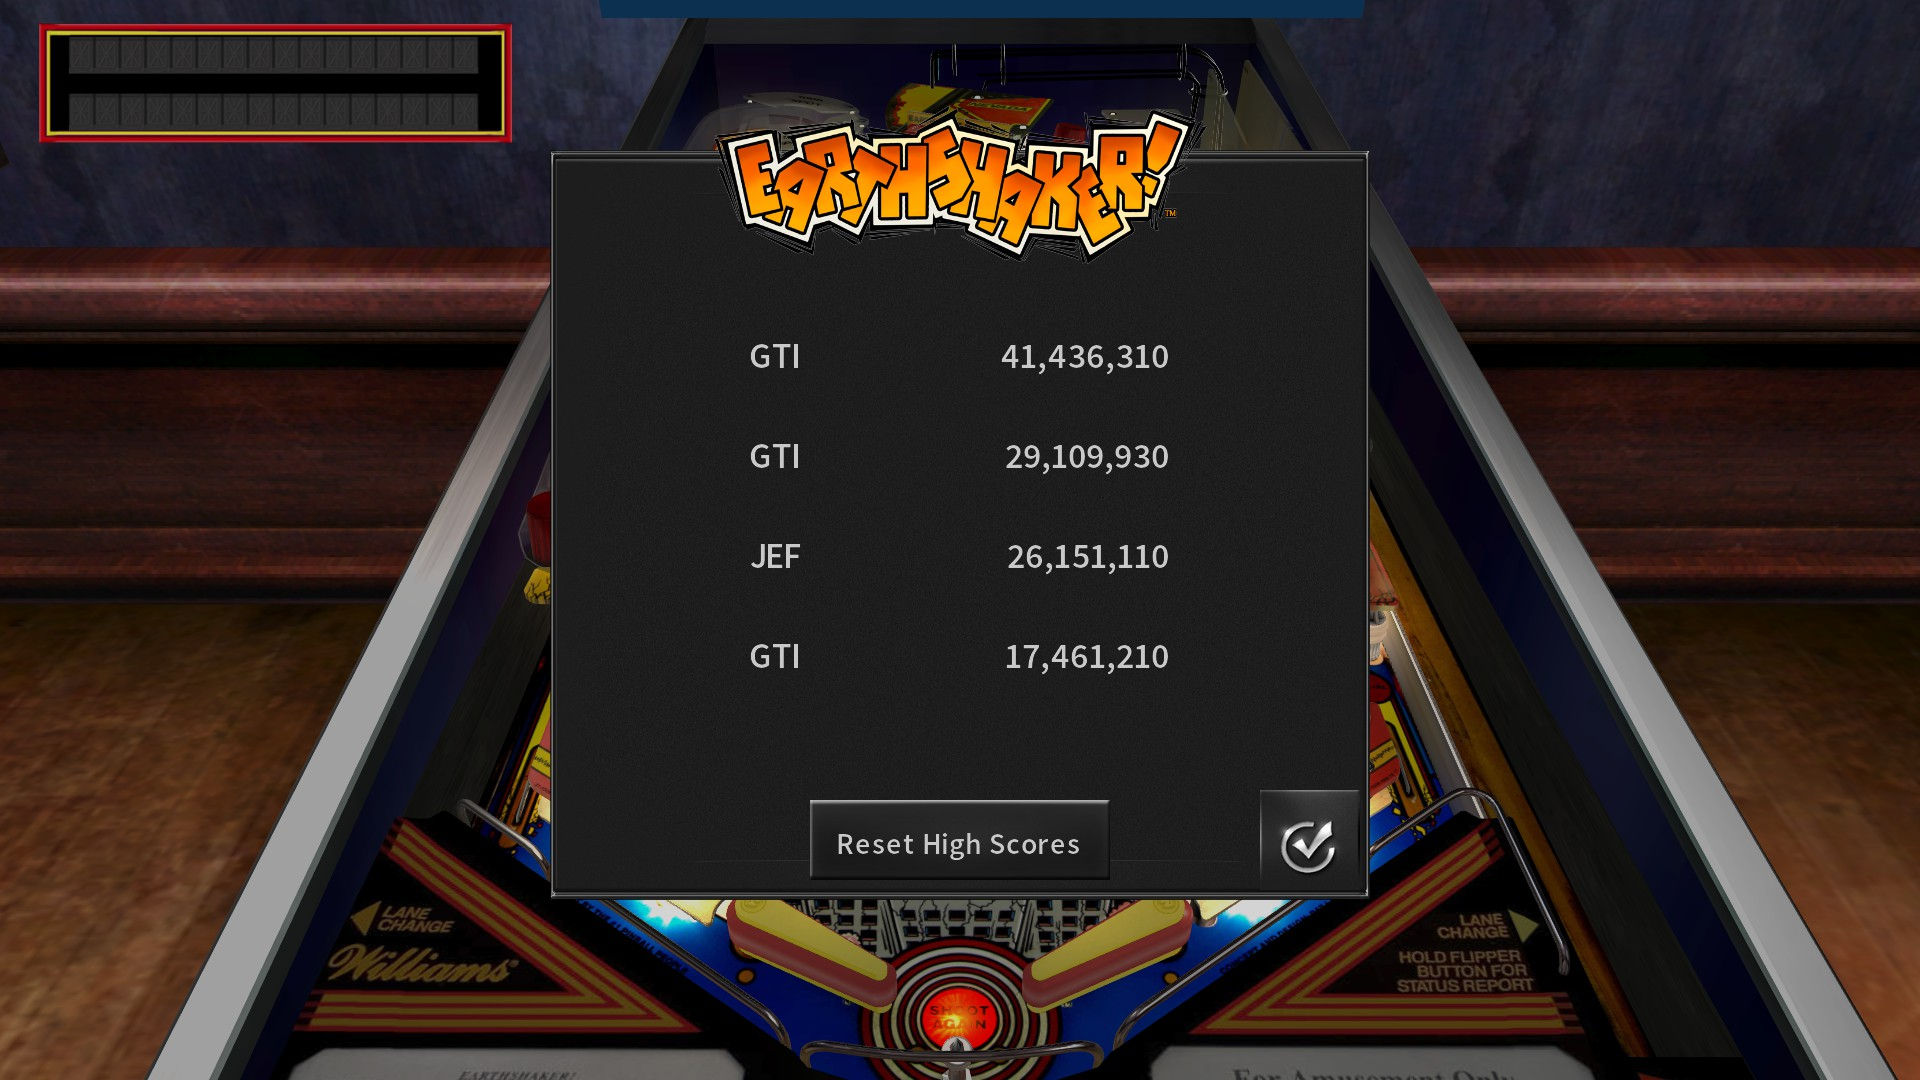 GTibel: Pinball Arcade: Earthshaker (PC) 41,436,310 points on 2017-10-06 12:46:47